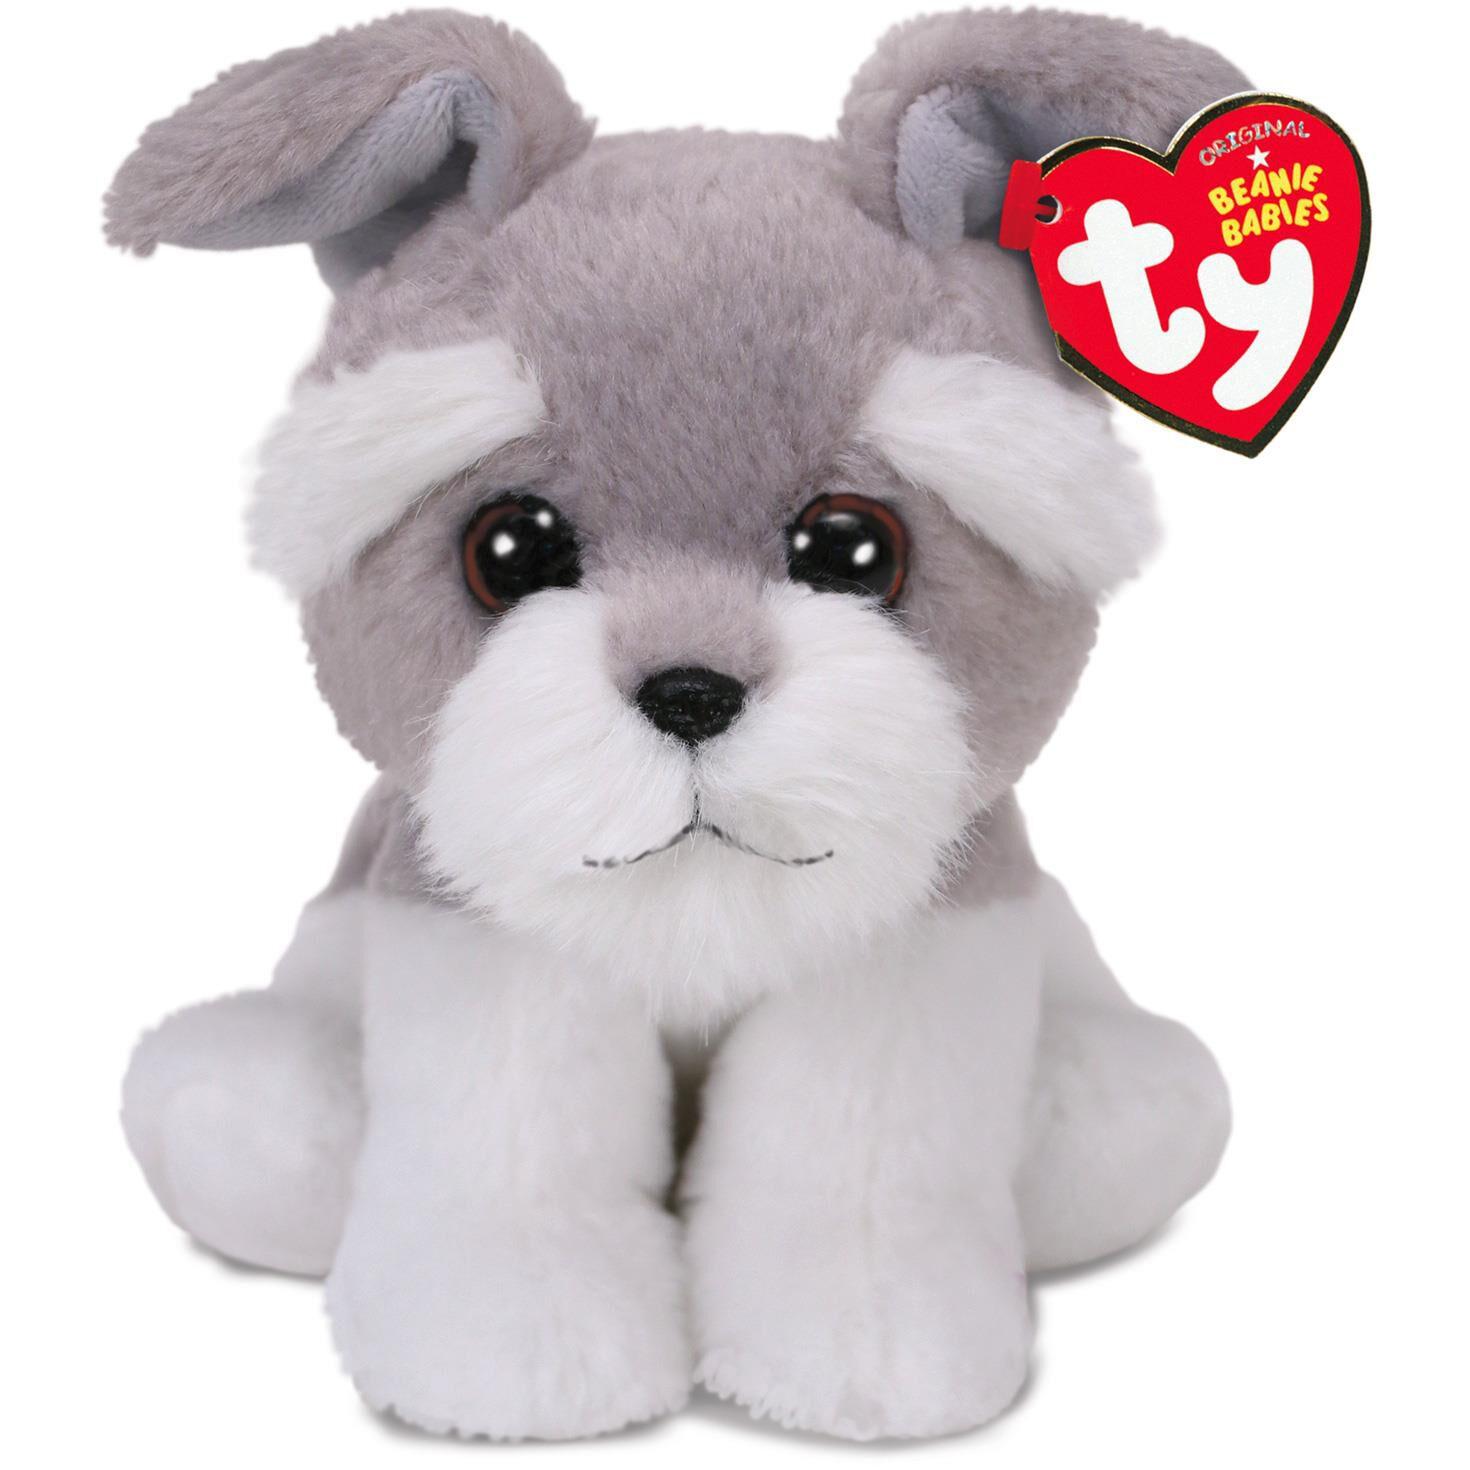 e768d4067 Ty® Beanie Babies Harper Grey Dog Stuffed Animal, 6